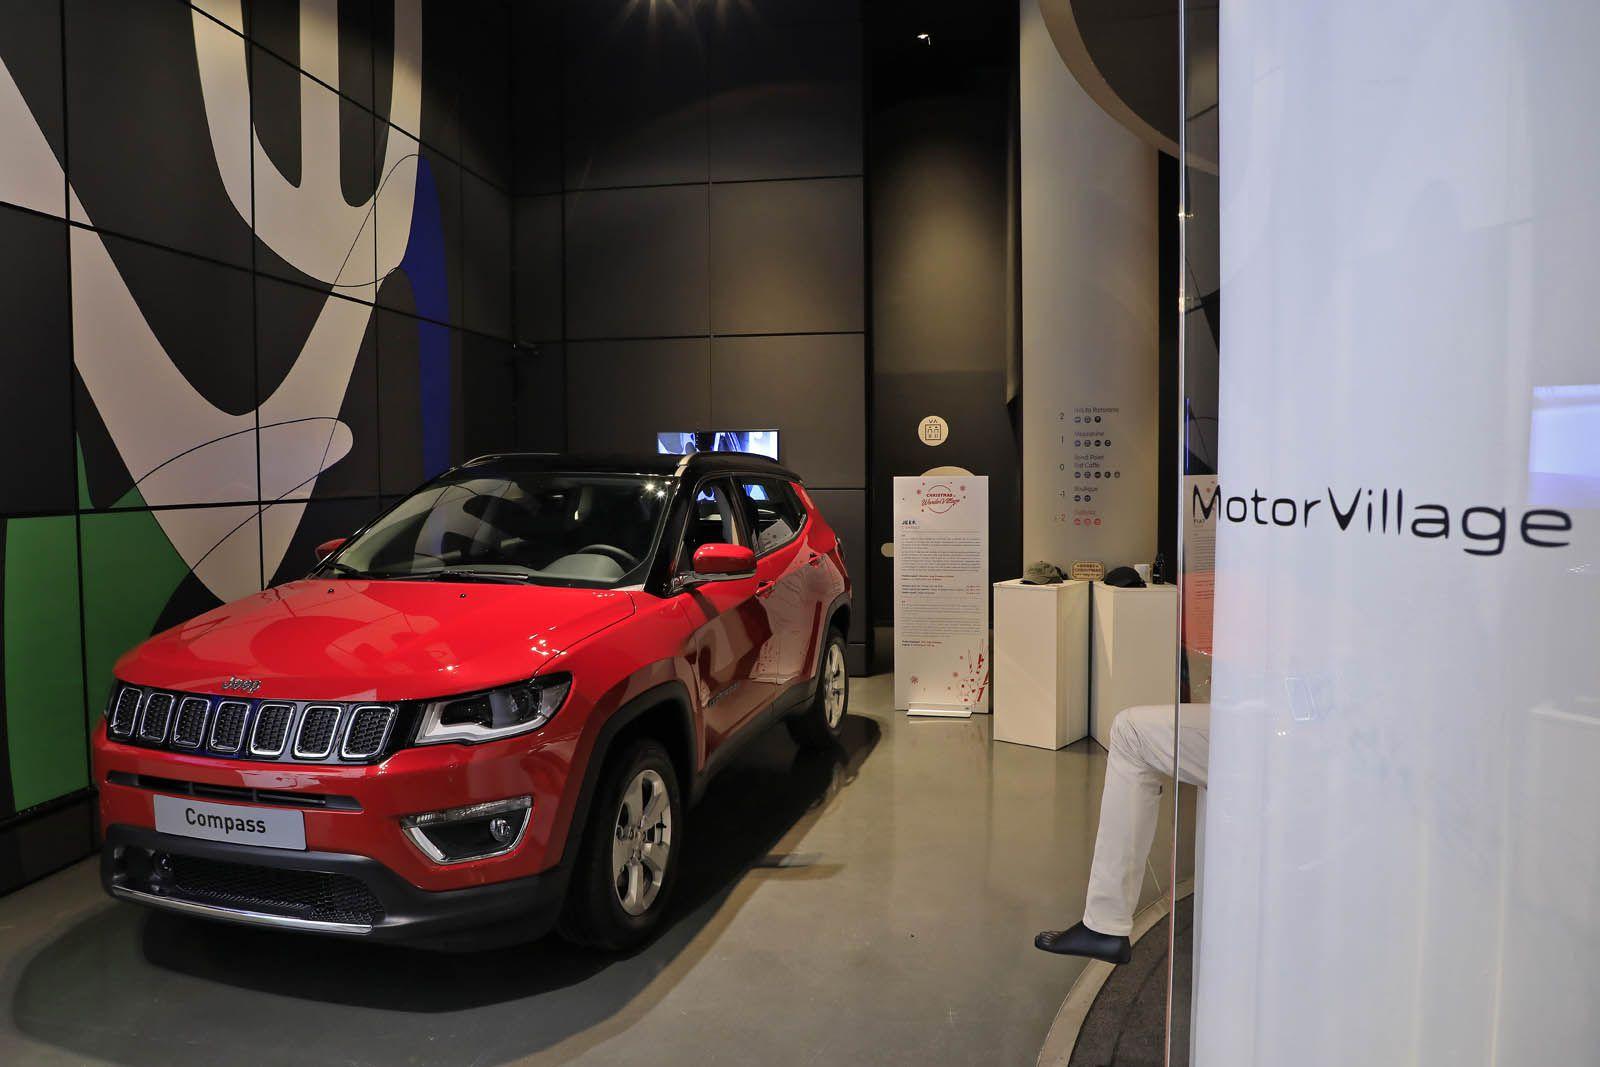 photo-expo-noel-motorvillage-paris-2017-1-017 Jeep lanseaza expozitia exclusiva Jeep Adventure la MotorVillage Champs-Elysées Paris